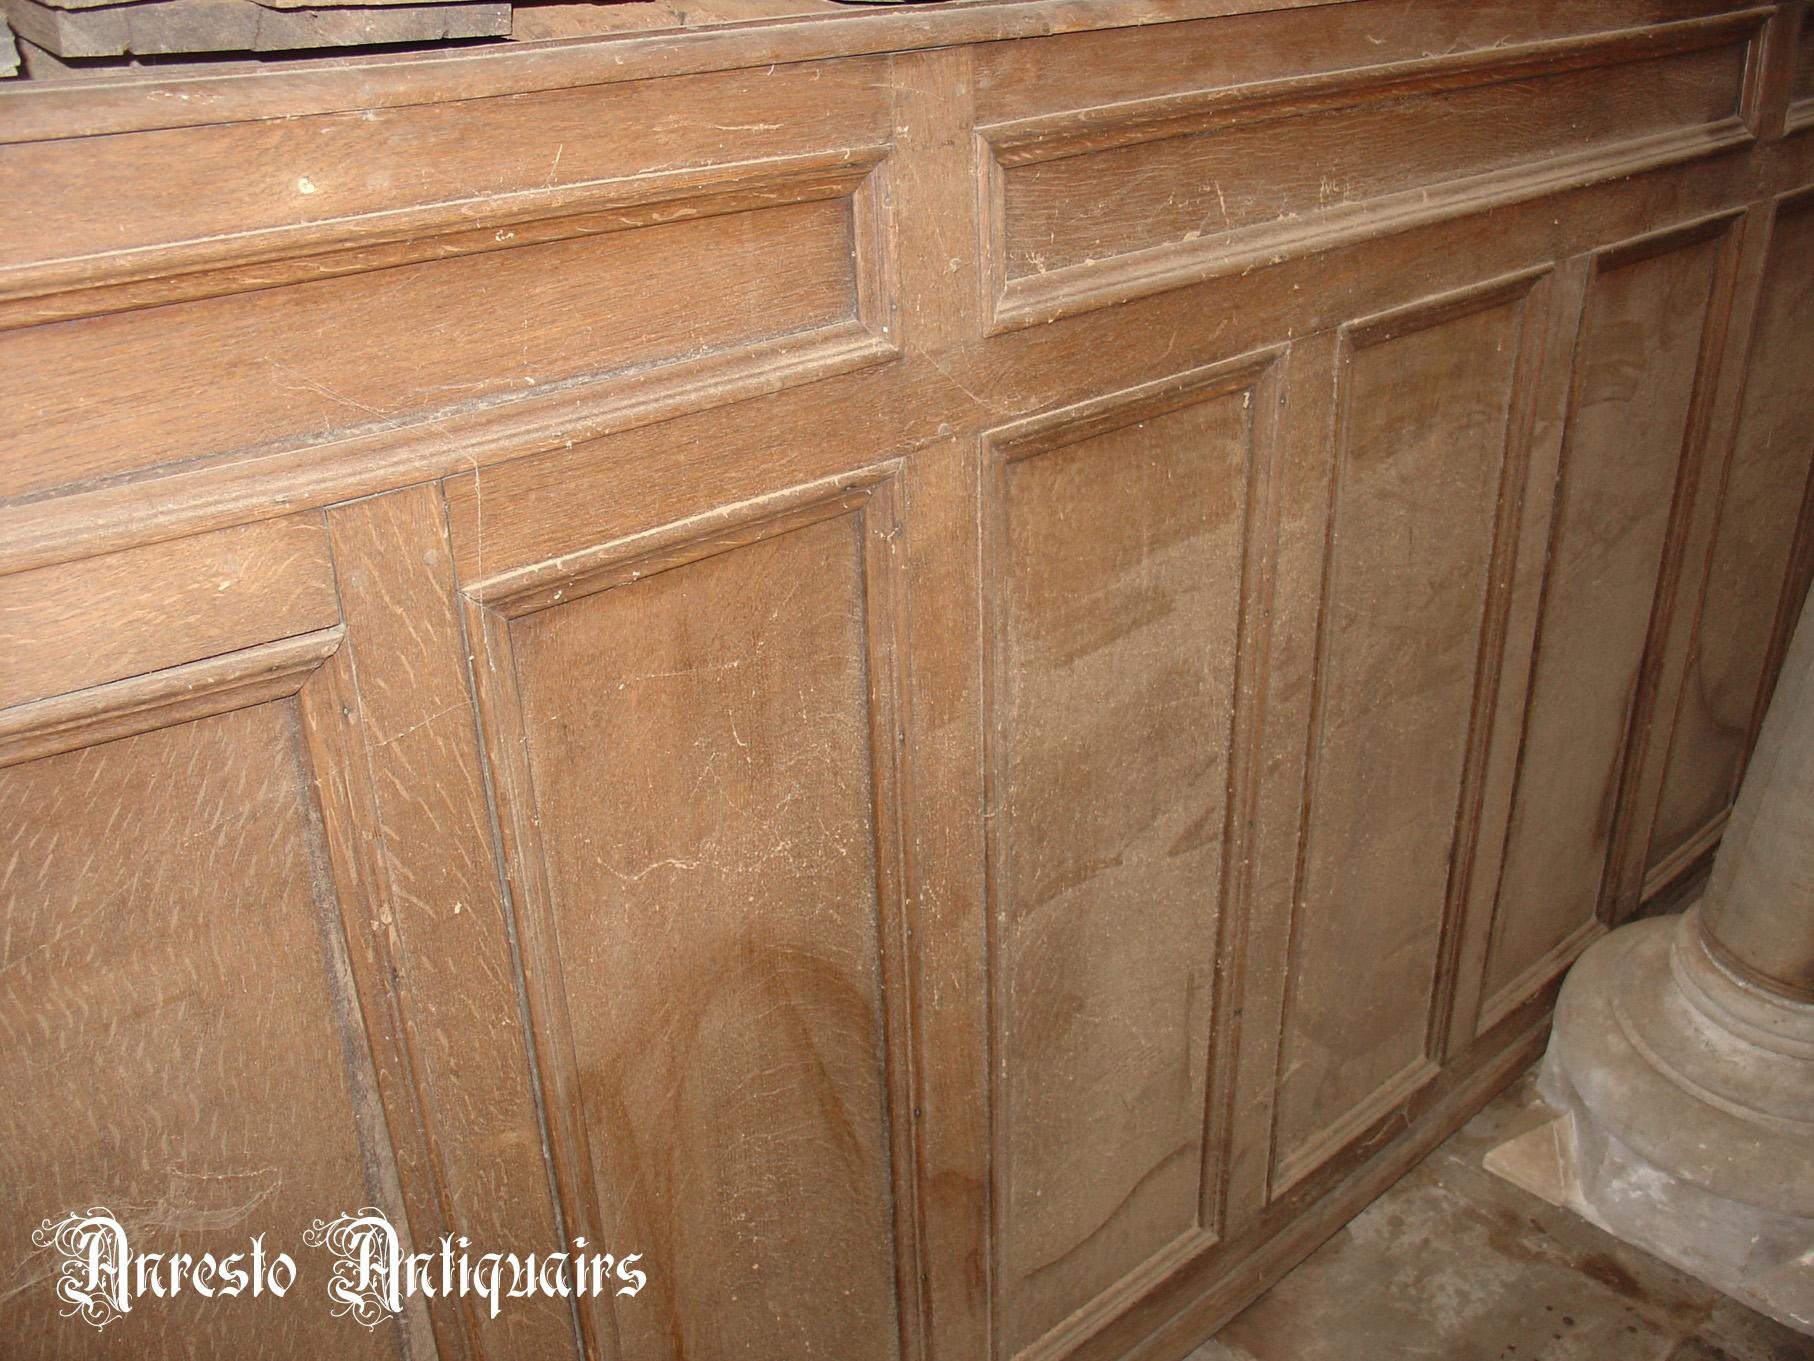 Ref. 10 – Antieke eikenhouten landelijke lambrisering, oude houten wandpanelen